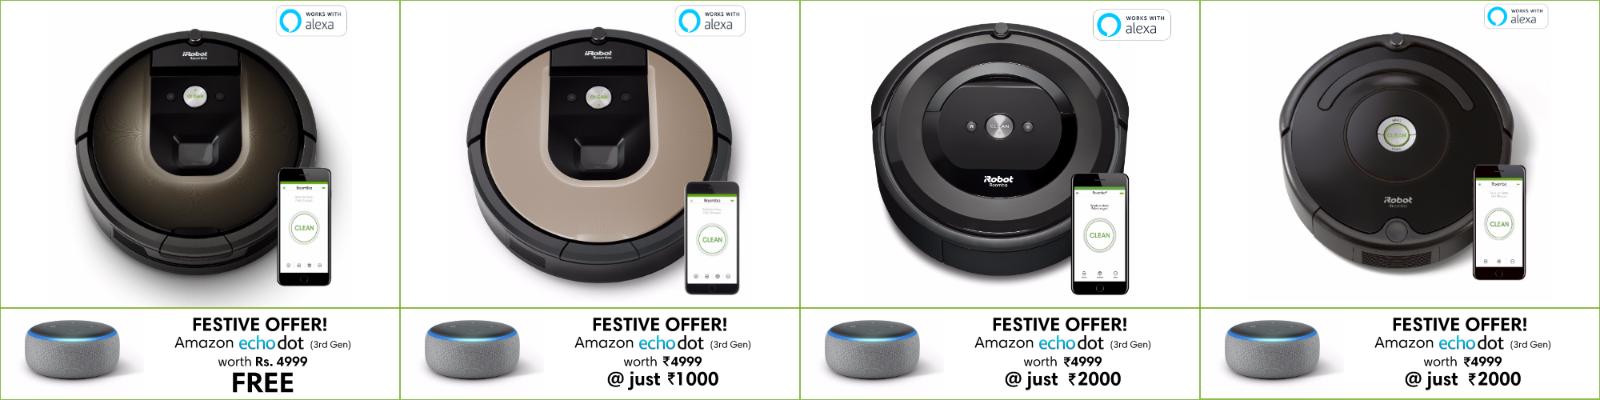 iRobot India Festive Offer 2018